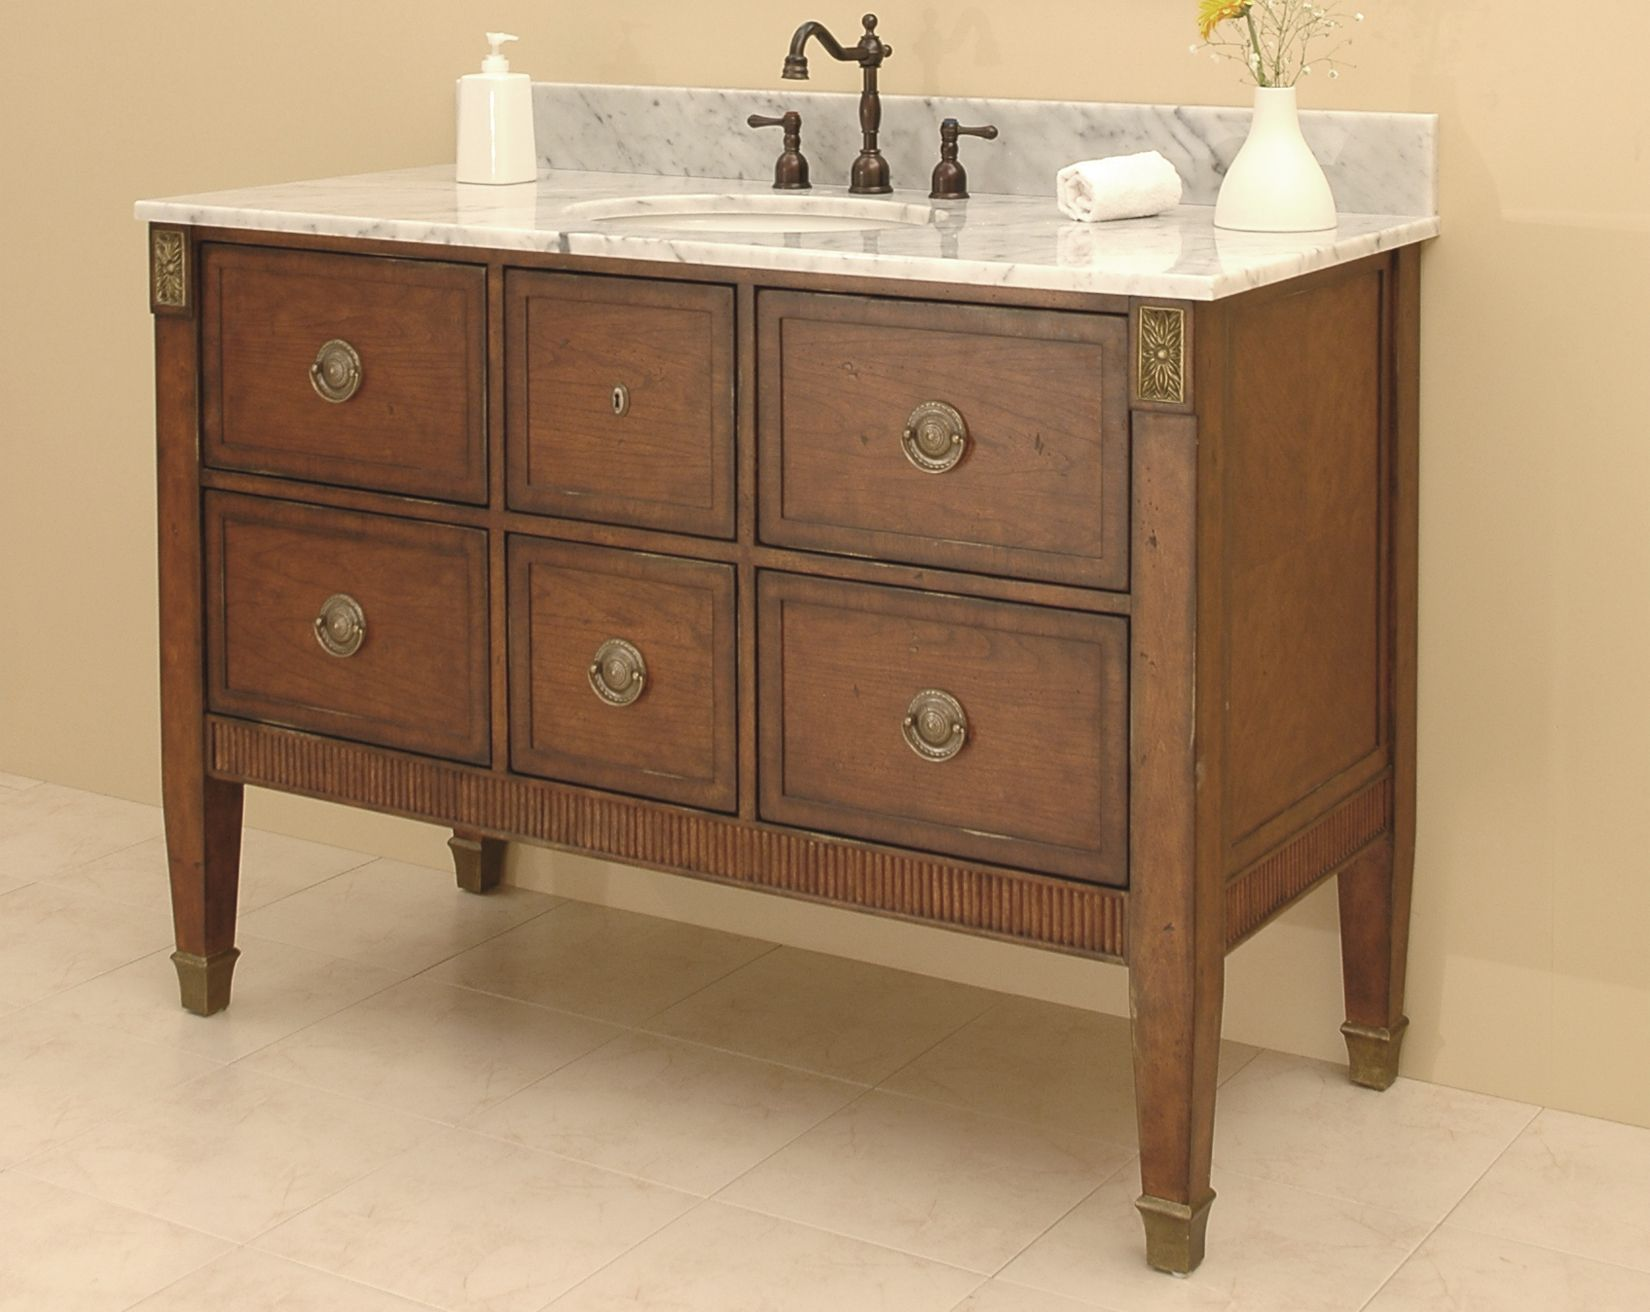 Sagehill Designs Bathroom Vanities The Blakely Manor Vanity From Sagehill Designssee Us At Www